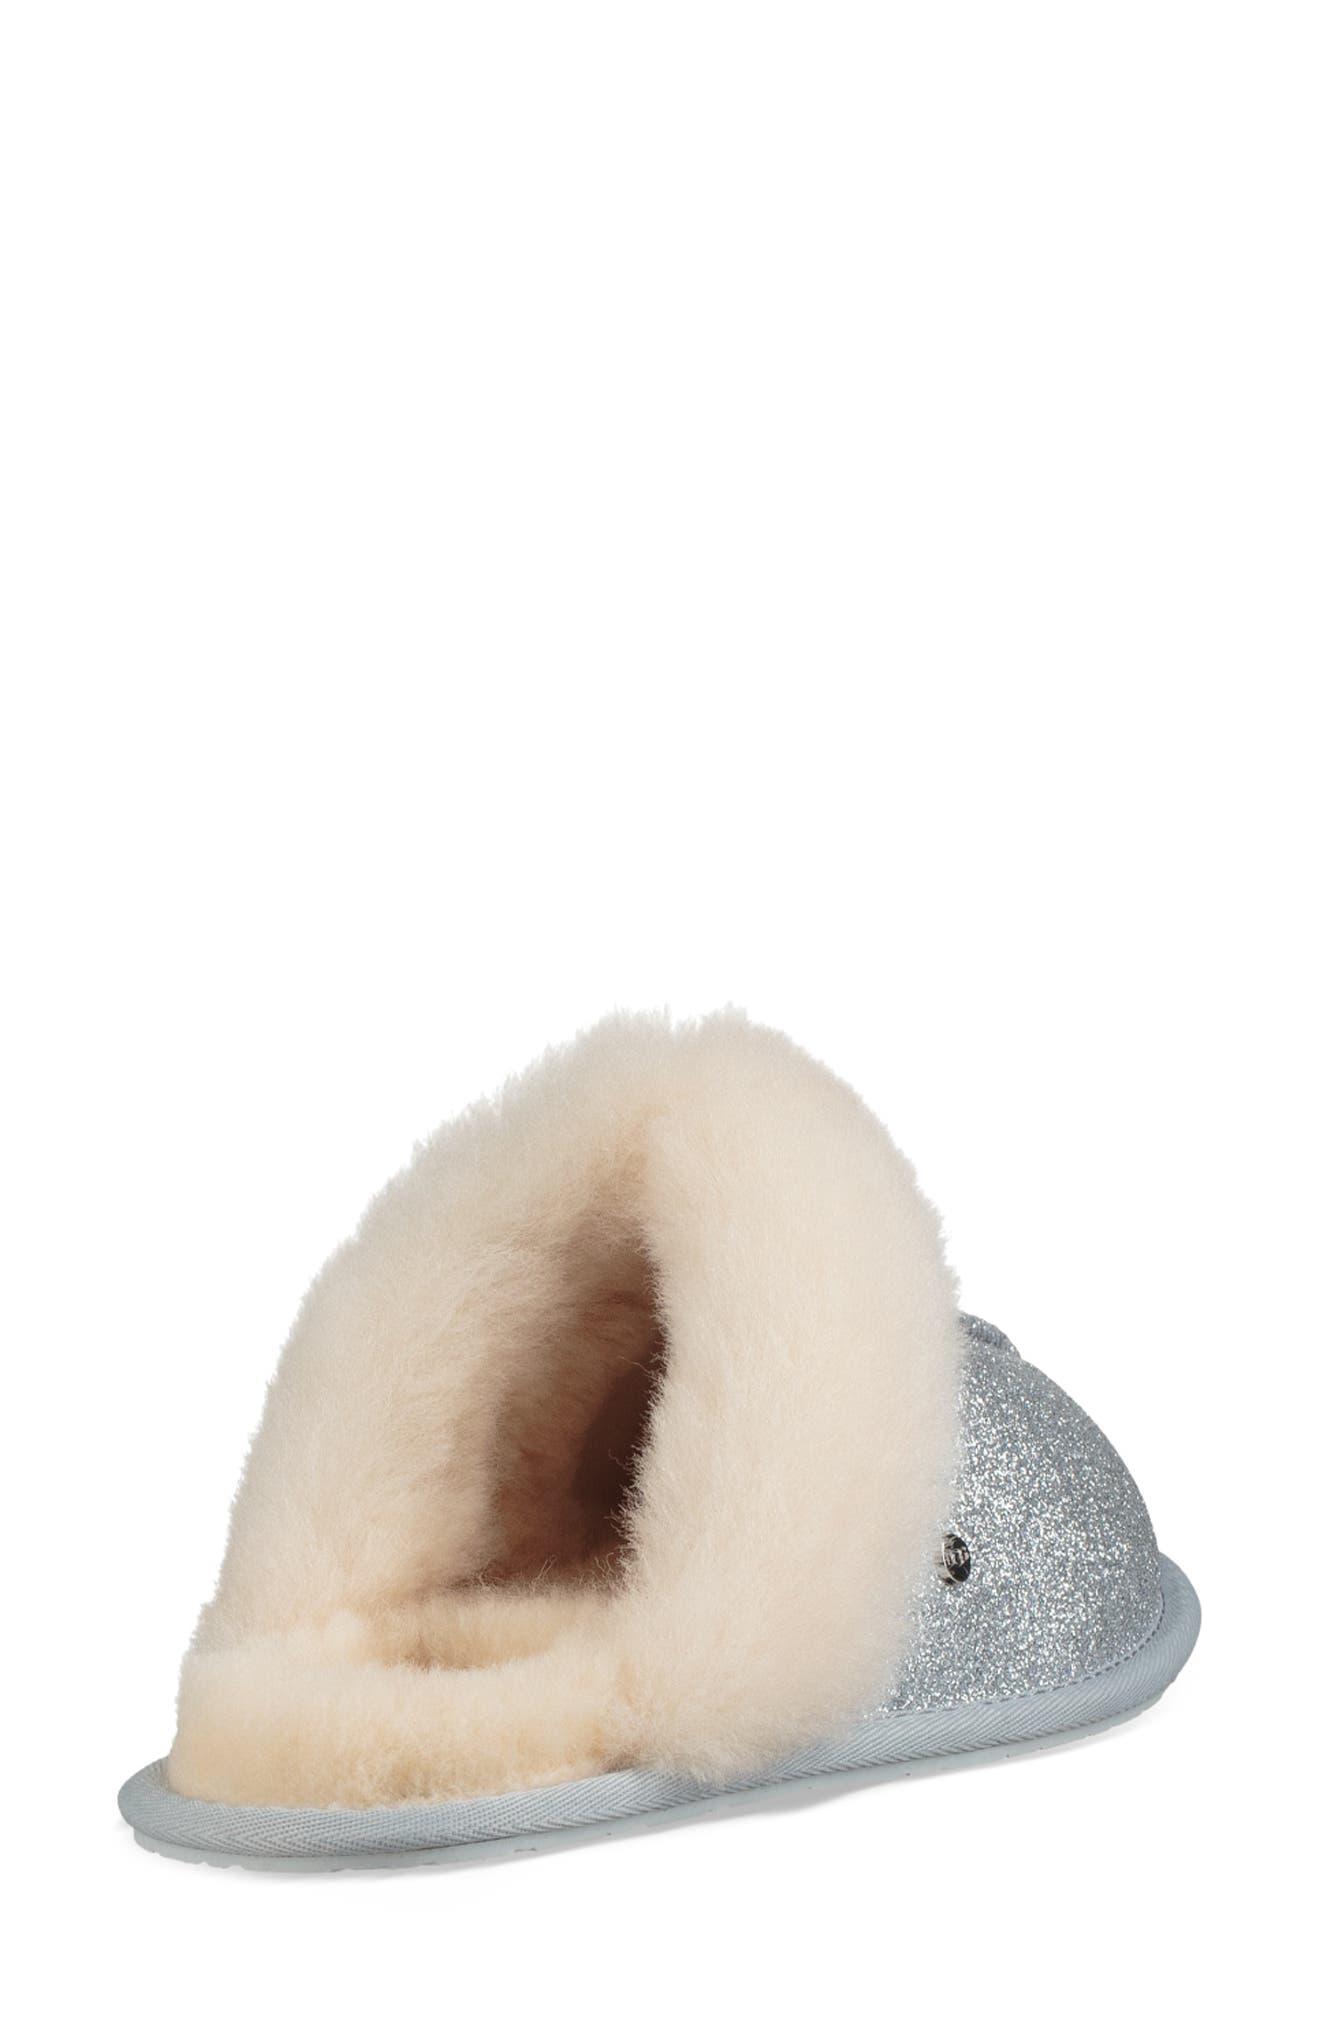 UGG<SUP>®</SUP>, Scuffette II Sparkle Genuine Shearling Slipper, Alternate thumbnail 2, color, SILVER